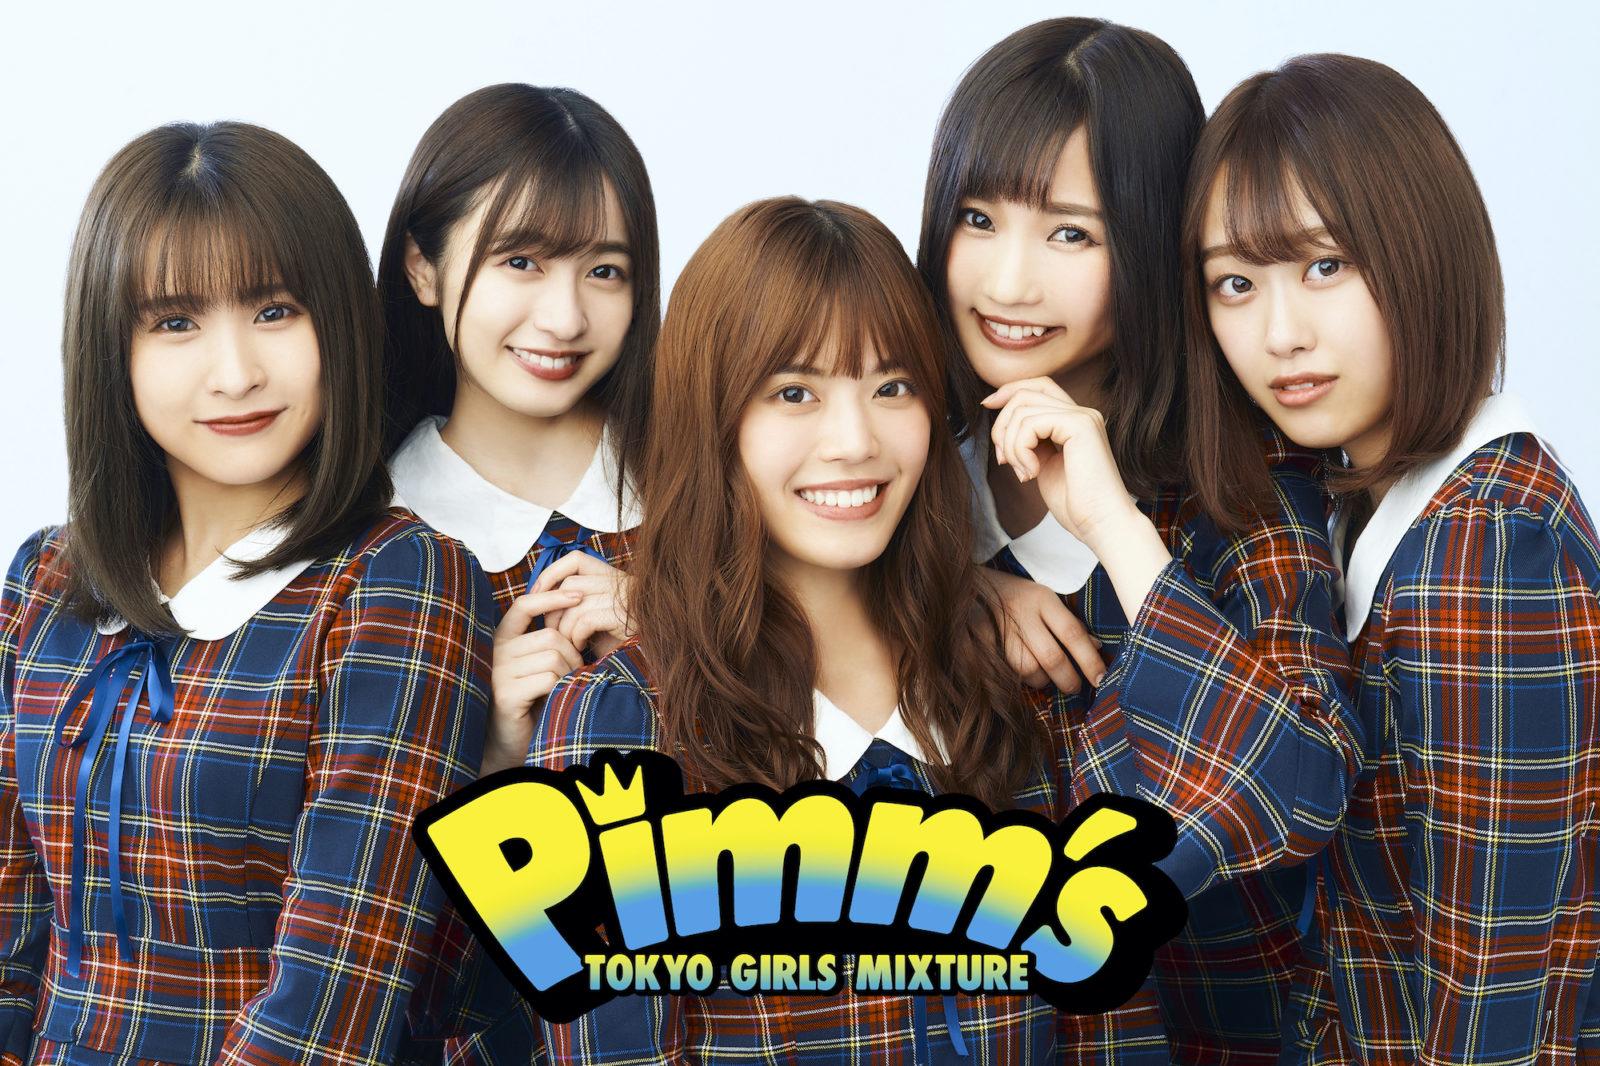 Pimm's、新体制初ライブ開催&新曲「BE ALL RIGHT」 のミュージックビデオ公開サムネイル画像